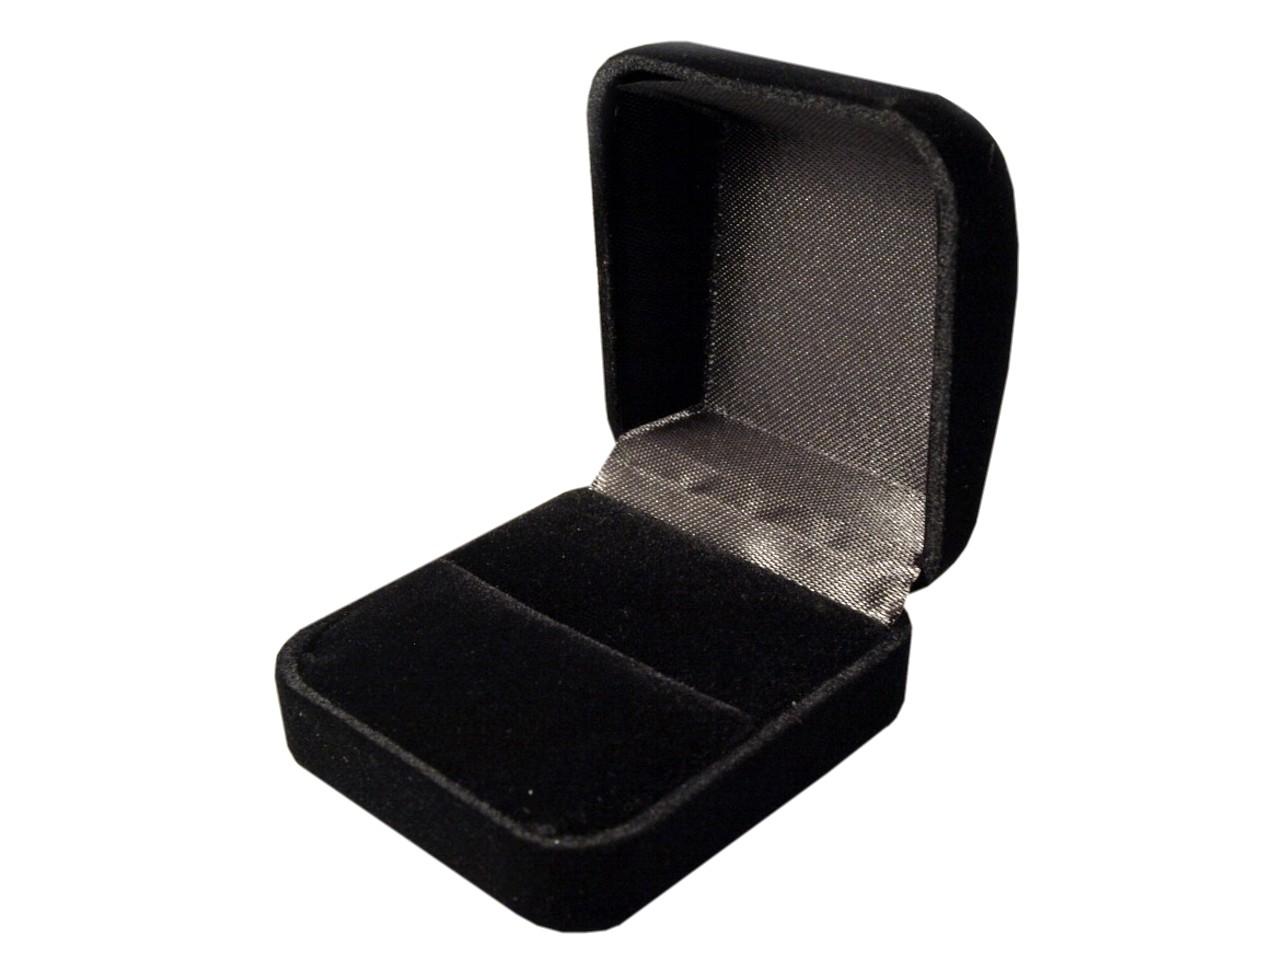 Krabička na šperky 30x 55x 60mm sametová EXCLUSIVE polstrovaná 1ks - 53 Kč / ks 1 černá